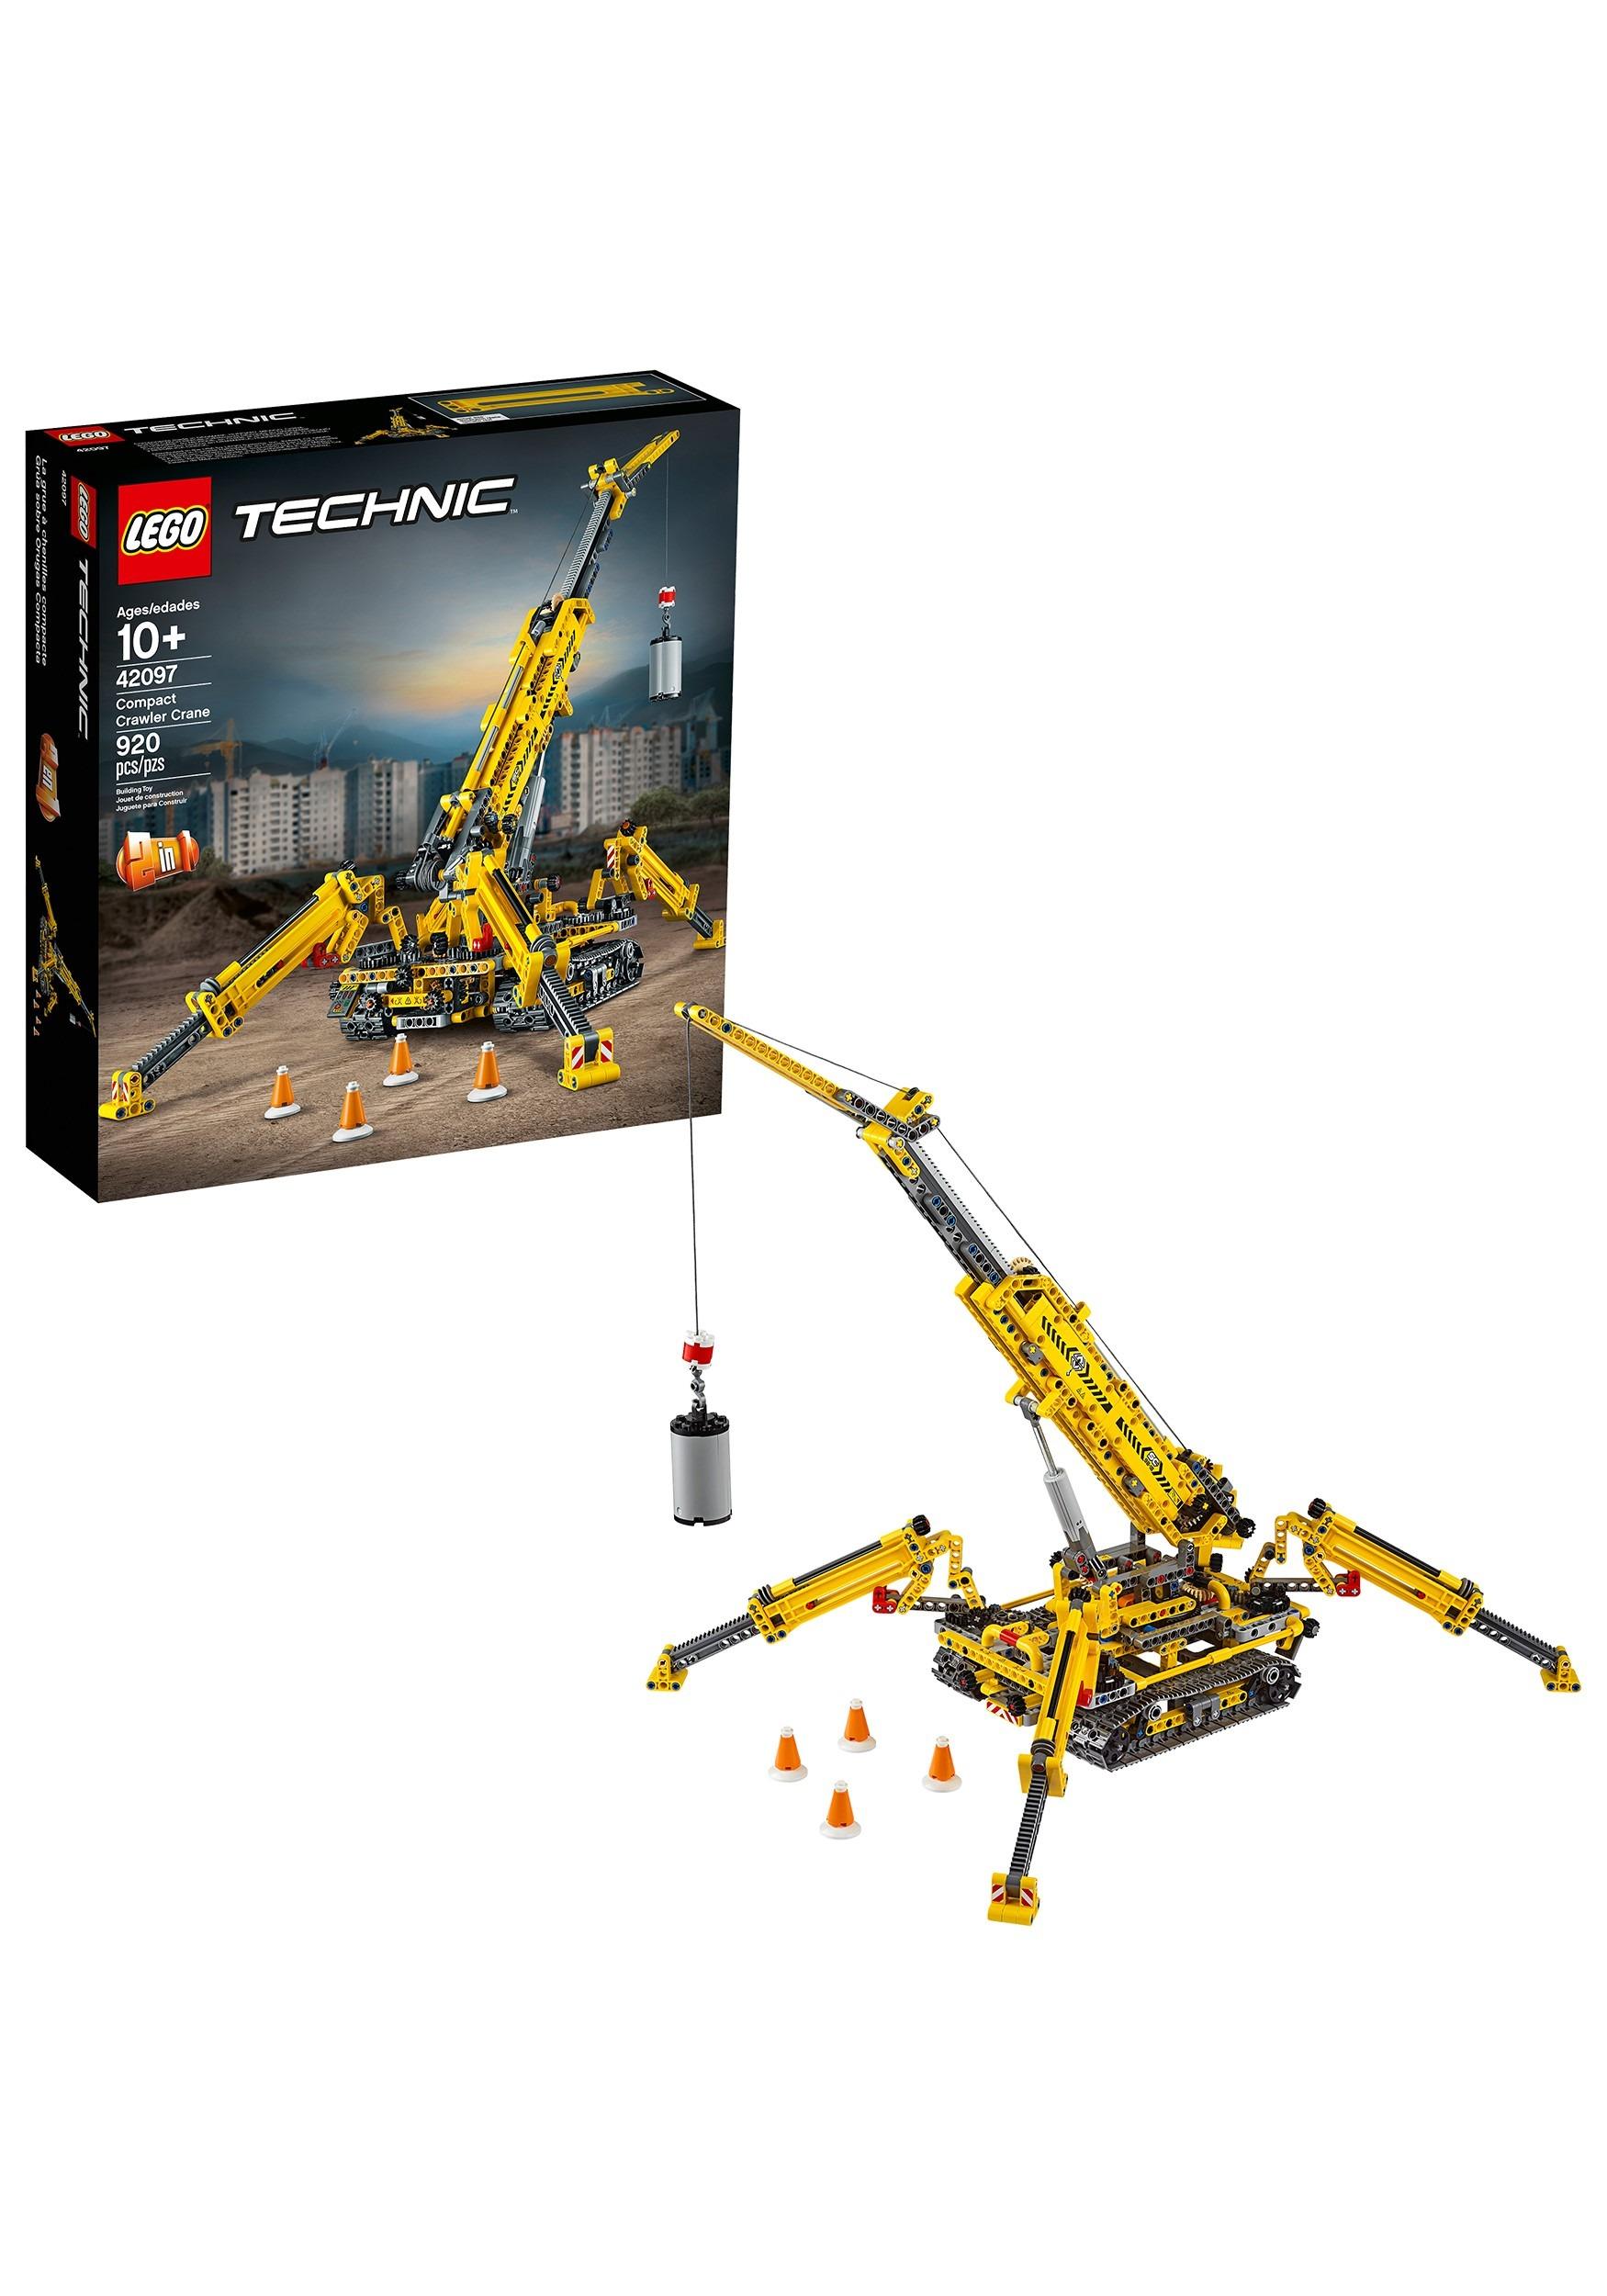 Technic LEGO Compact Crawler Crane